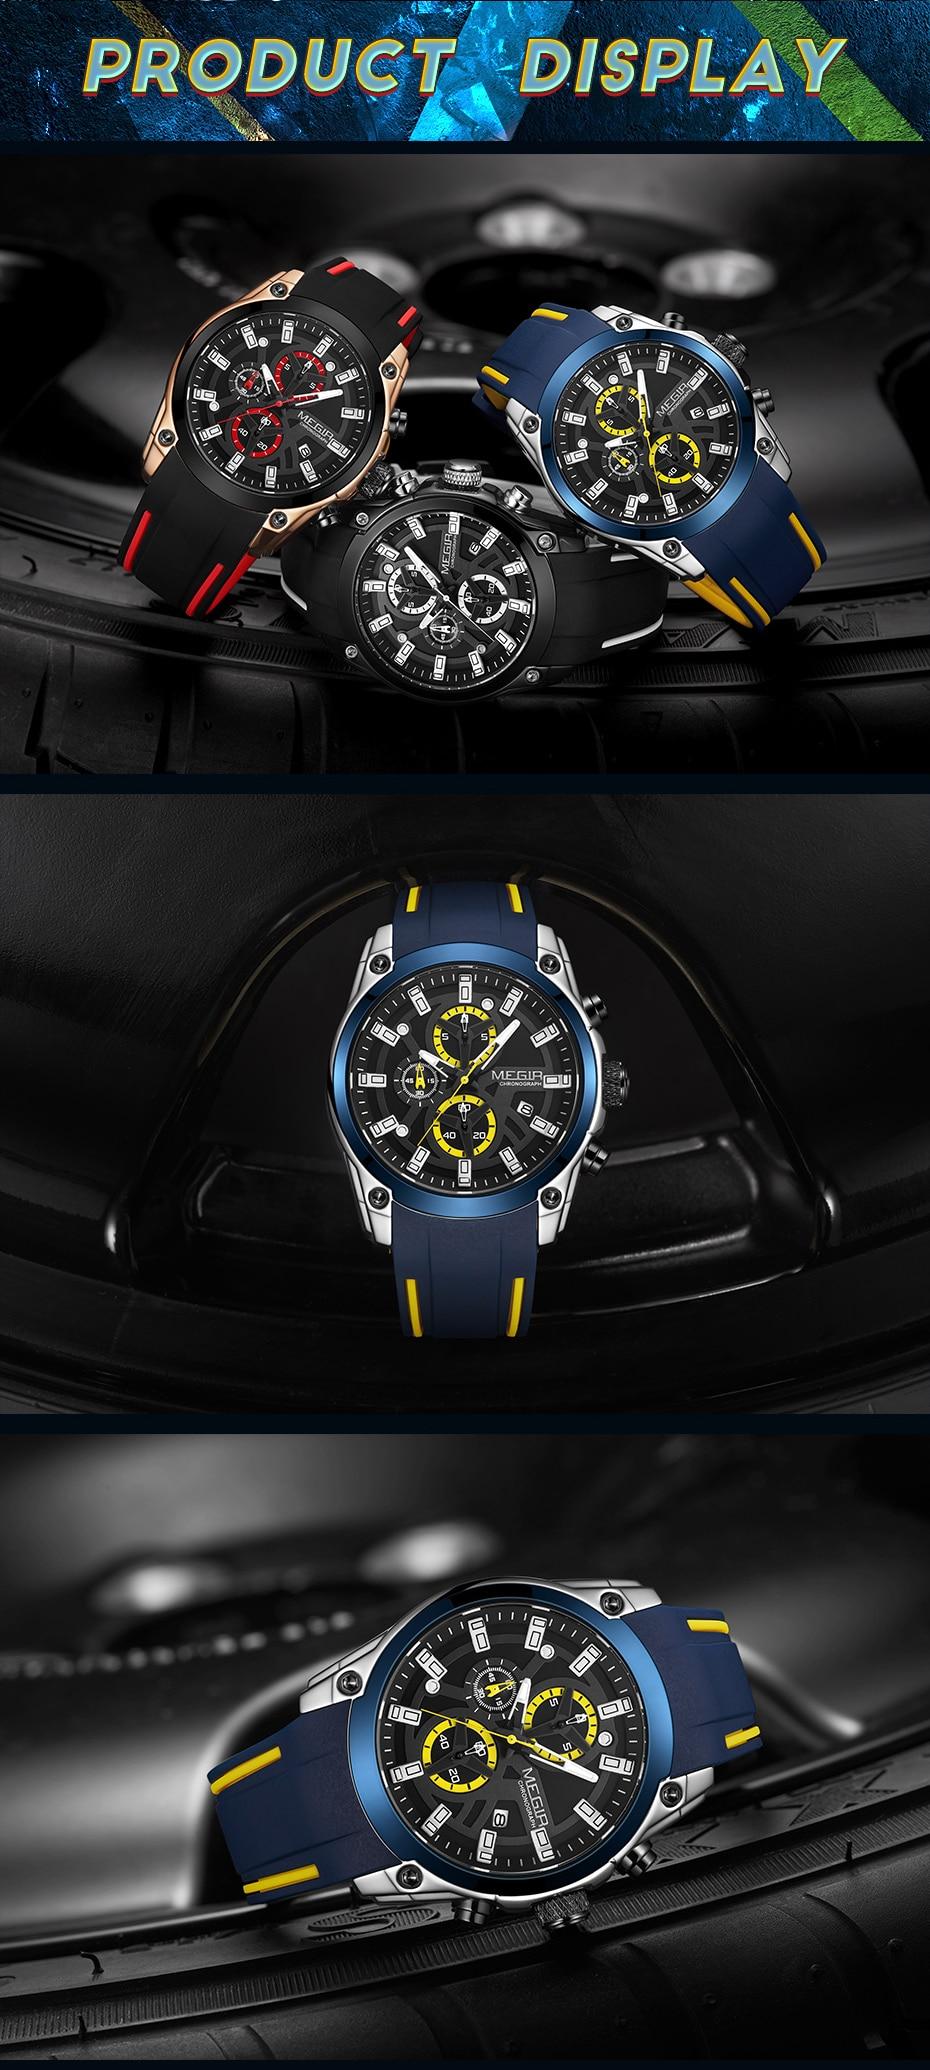 He8eb2fd0dce44438b06d86617843c6c5d MEGIR 2020 Blue Sport Watches for Men